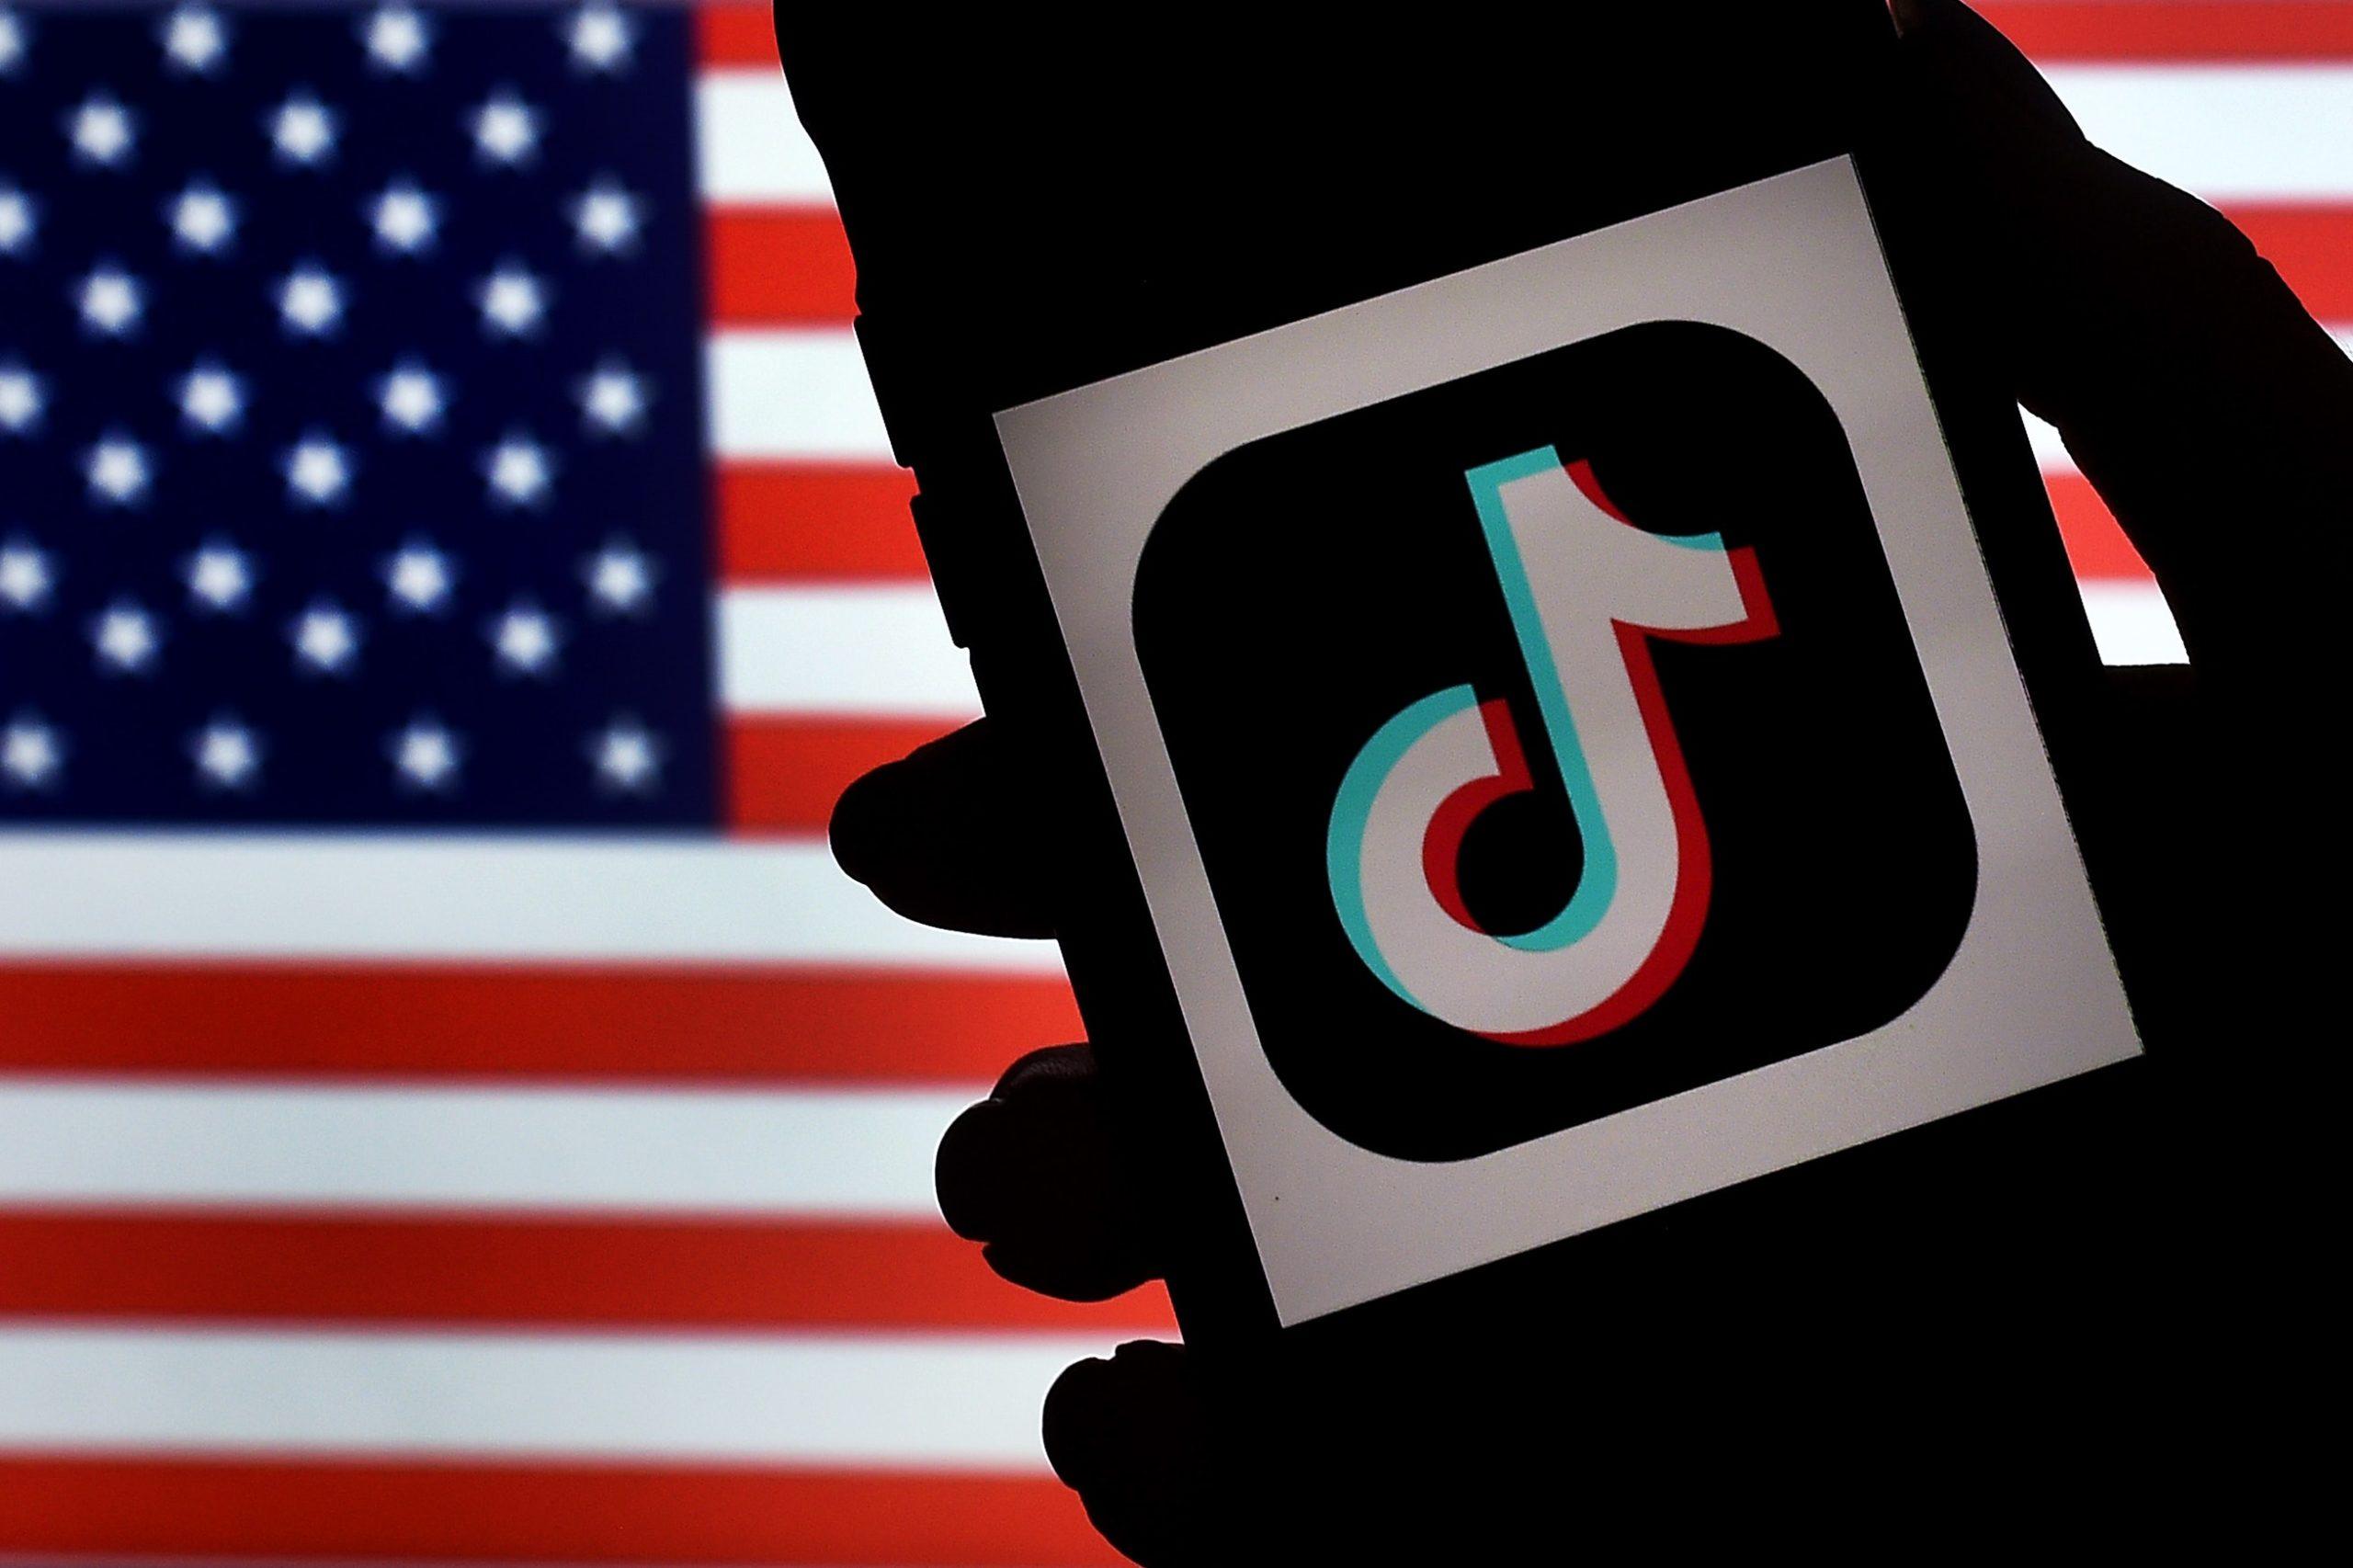 TikTok And America's Bleak Techno-Nationalism